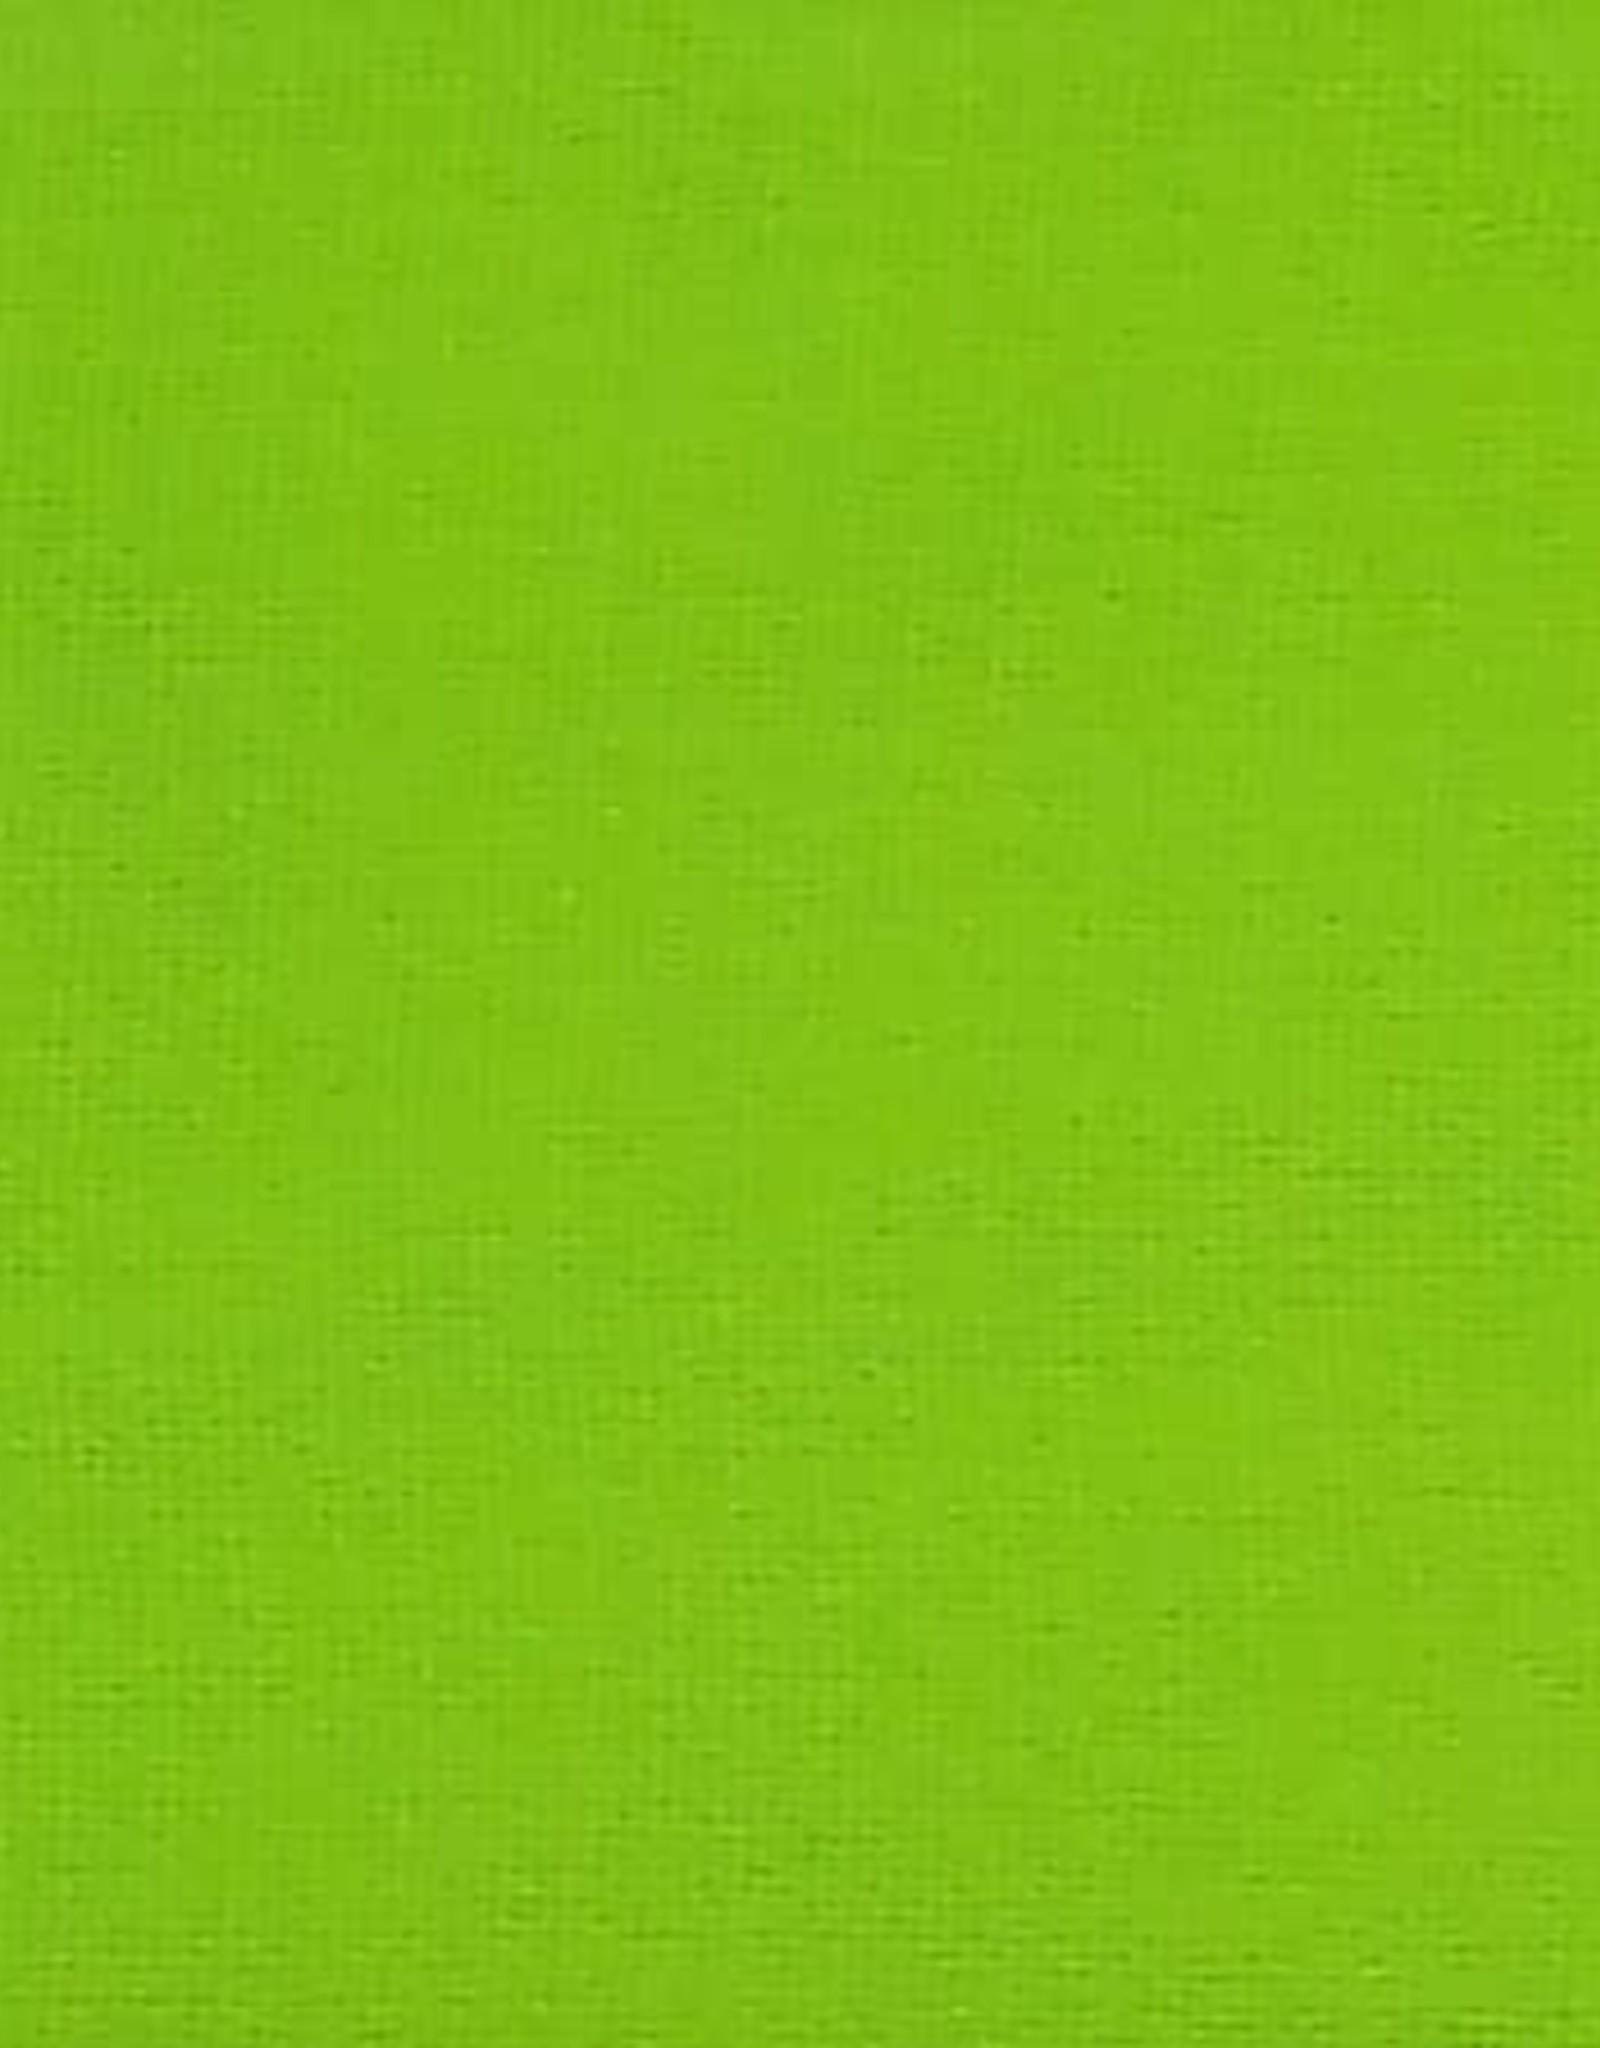 Chiffon 58 - 60 Inches Apple Green (Yard)